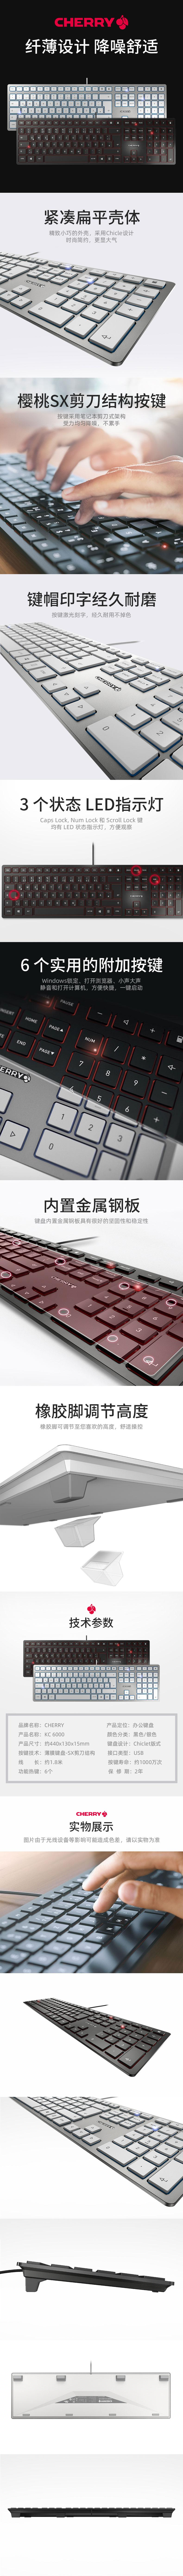 KC-6000-有线键盘.jpg